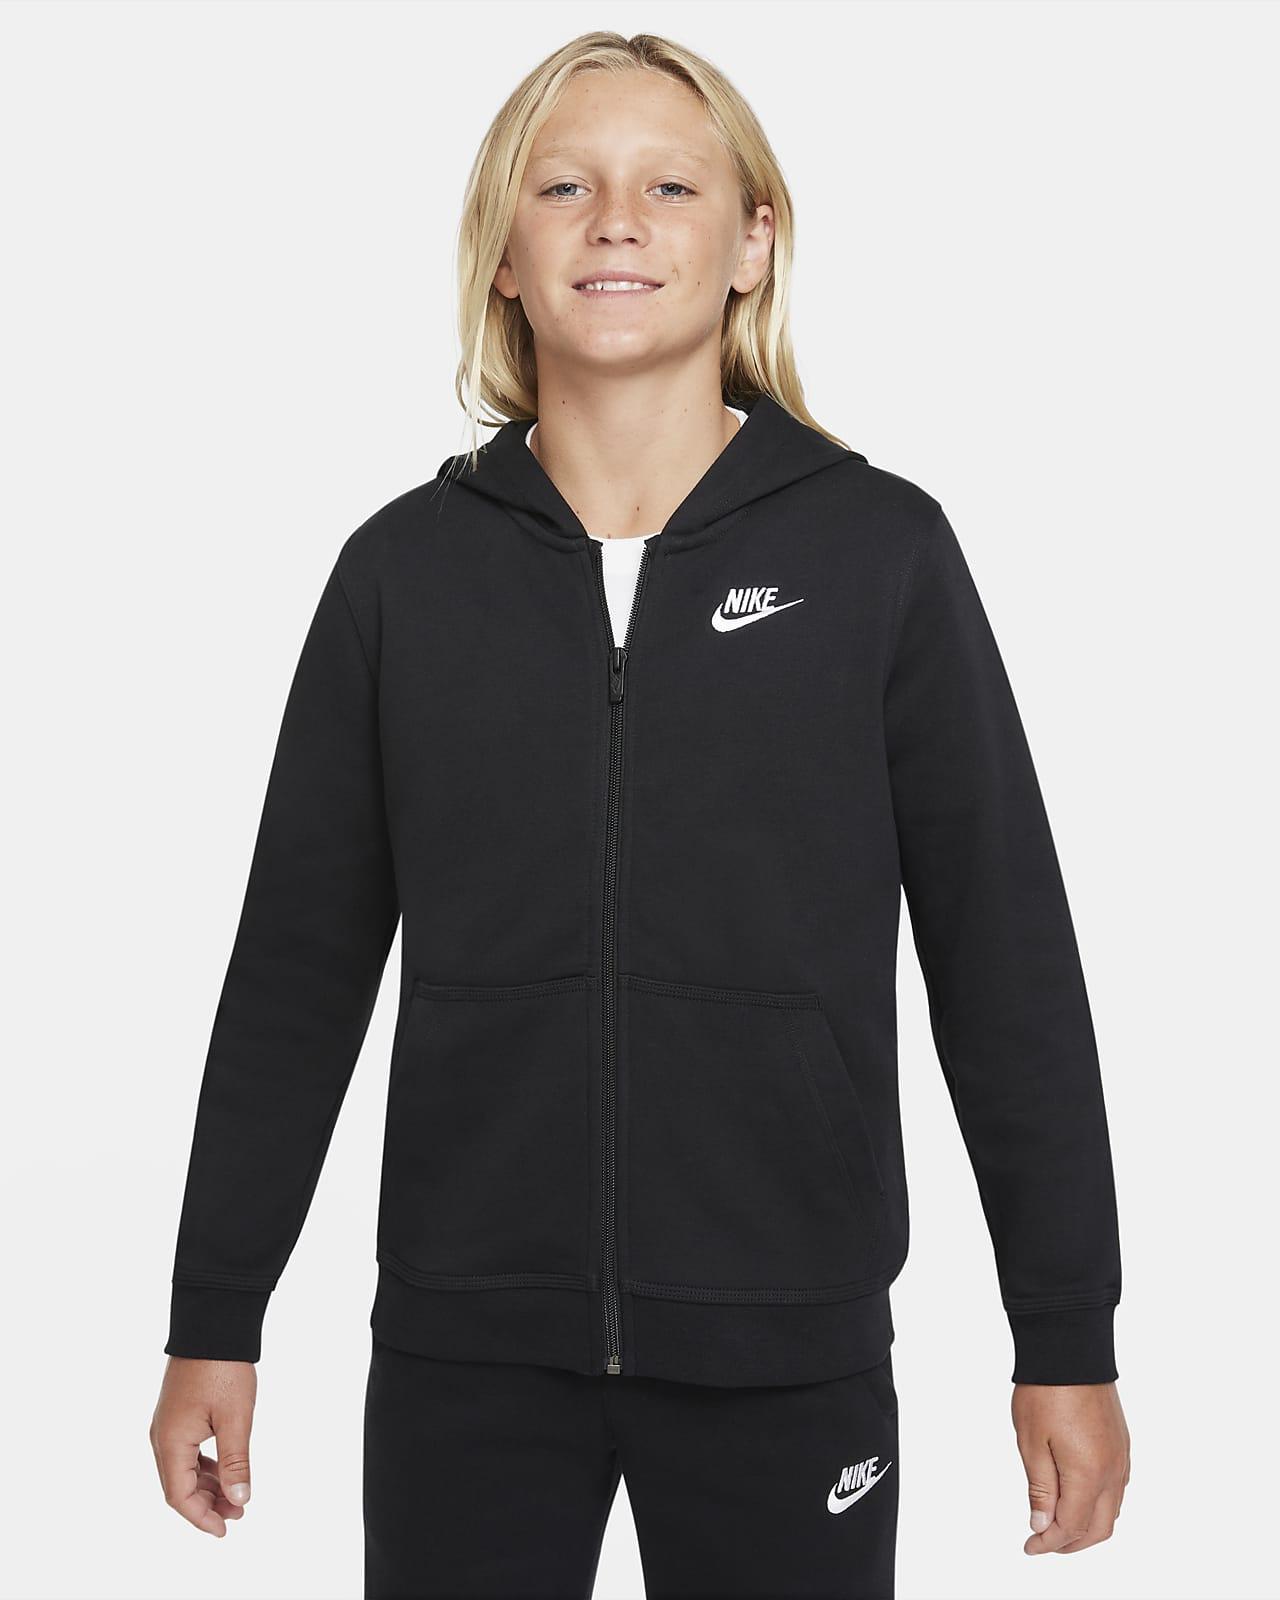 Nike Sportswear Club Dessuadora amb caputxa i cremallera completa de teixit French Terry - Nen